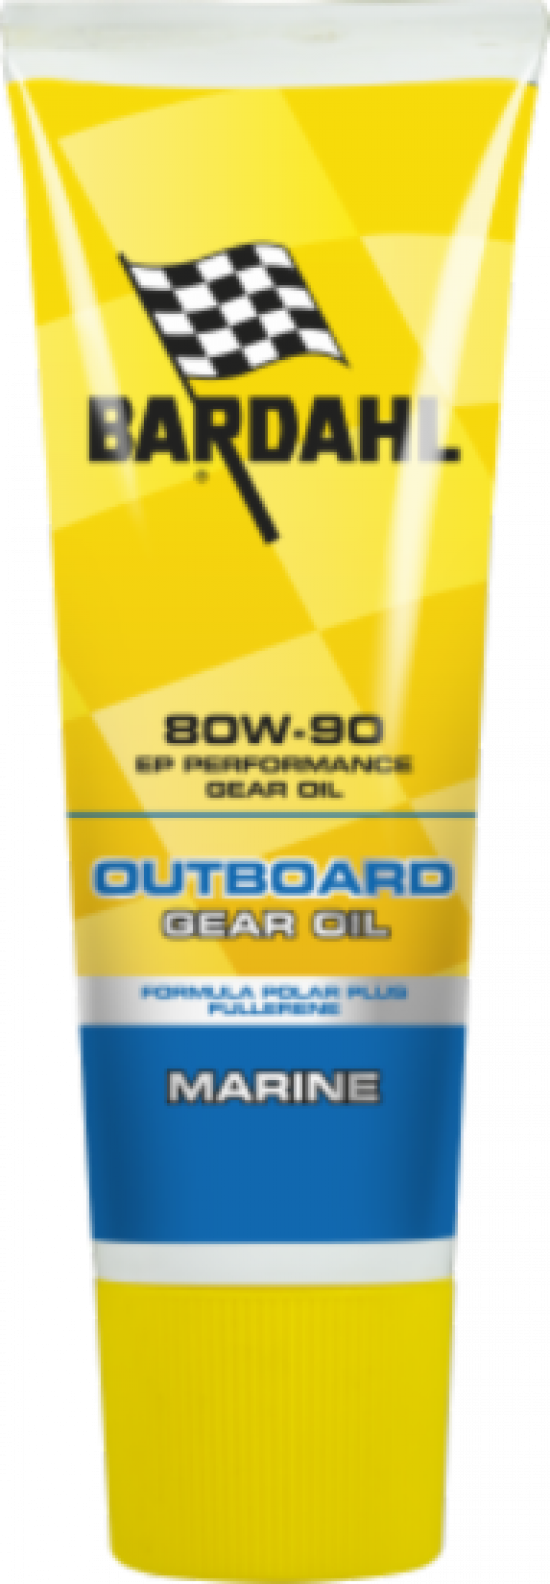 Bardahl OUTBOARD GEAR OIL